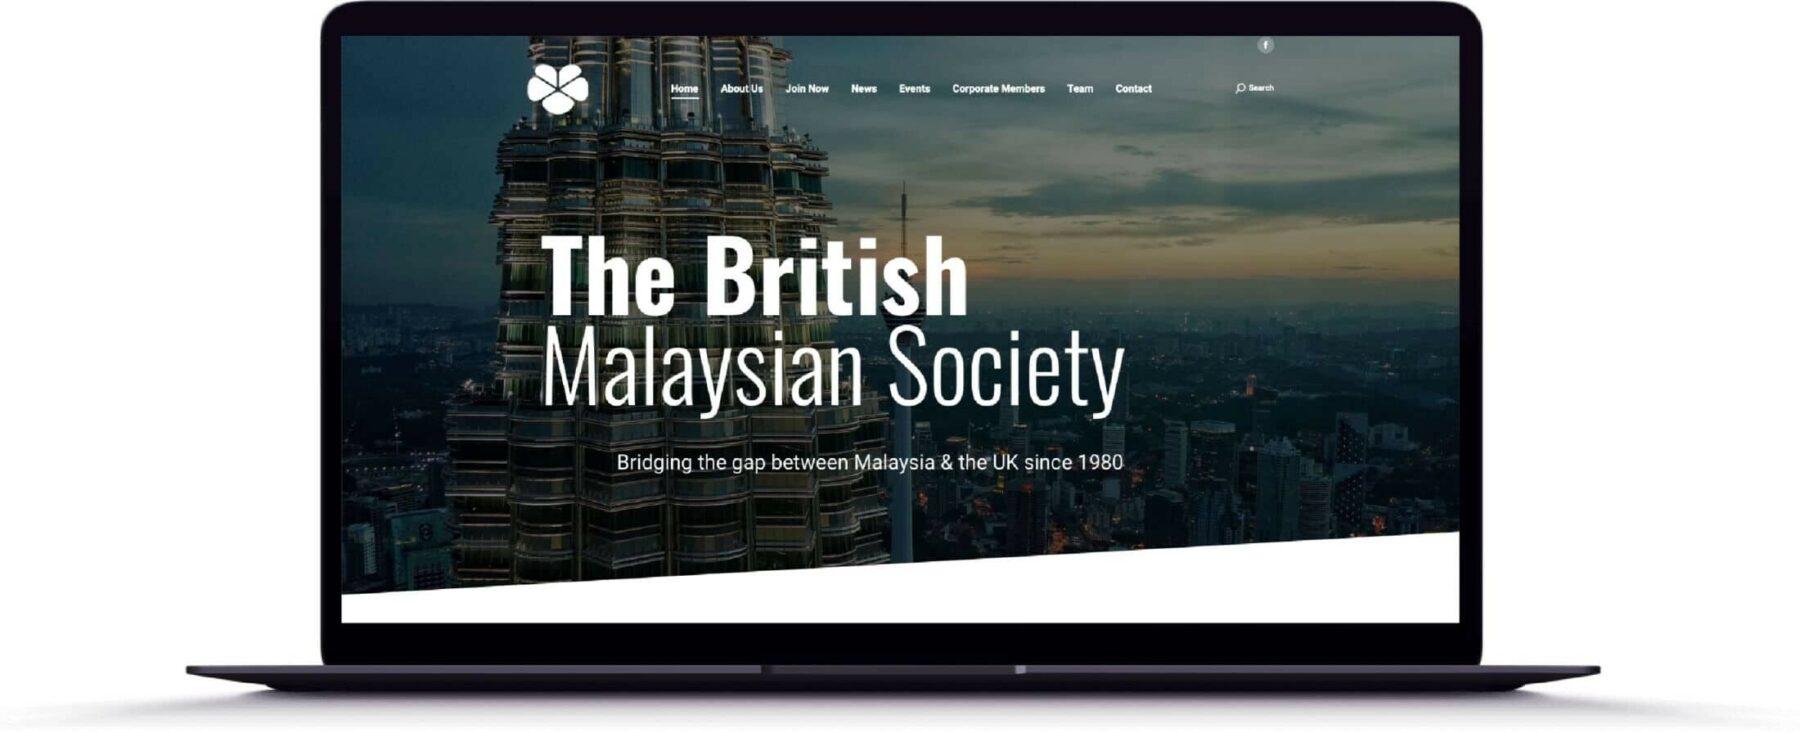 Web Design for The British Malaysian Society, Kuala Lumpur, Malaysia